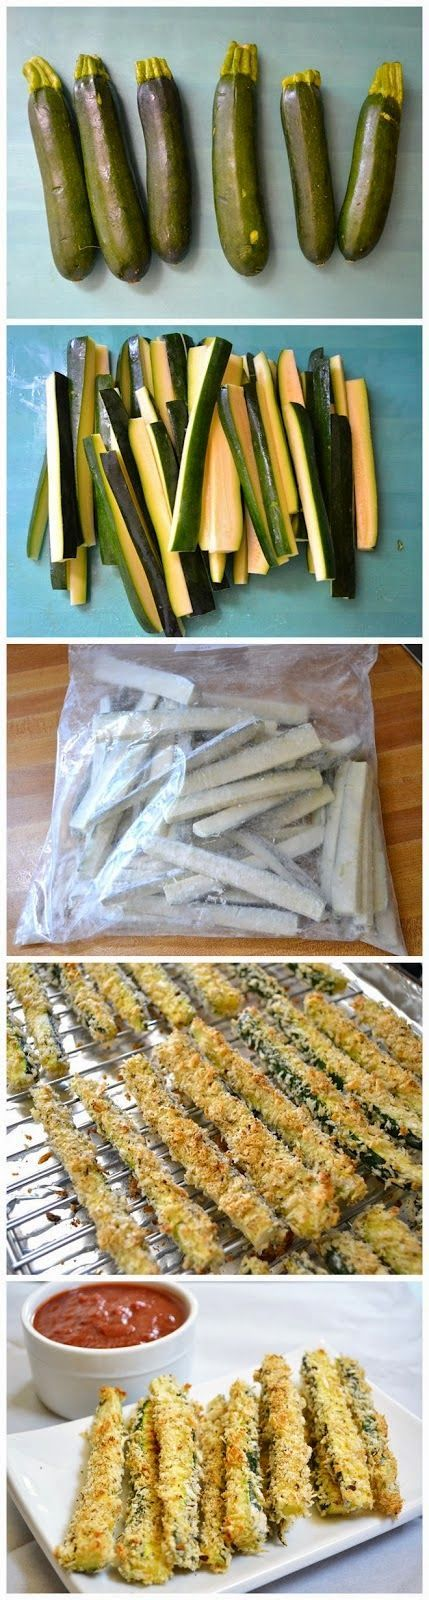 papas fritas de calabacín al horno - baked zucchini fries | https://lomejordelaweb.es/